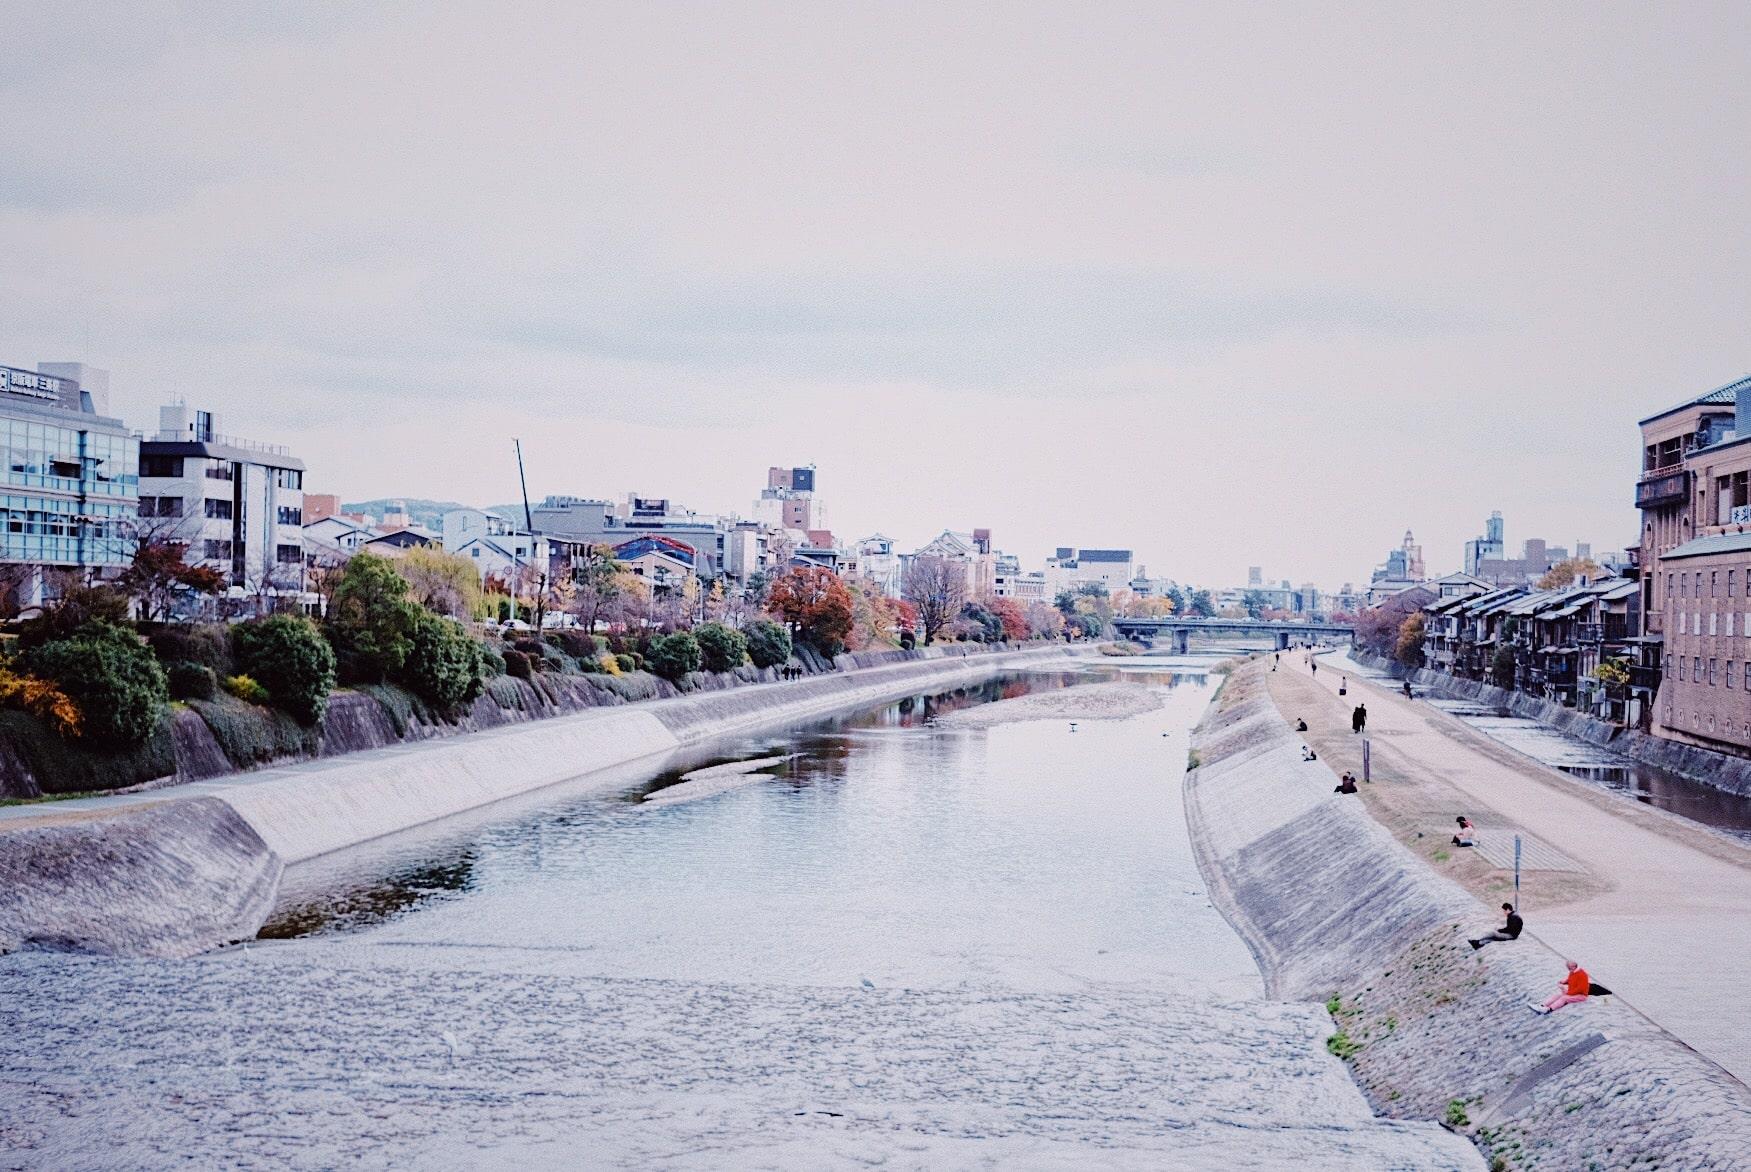 合宿で勉強会 &大人の修学旅行!鴨川